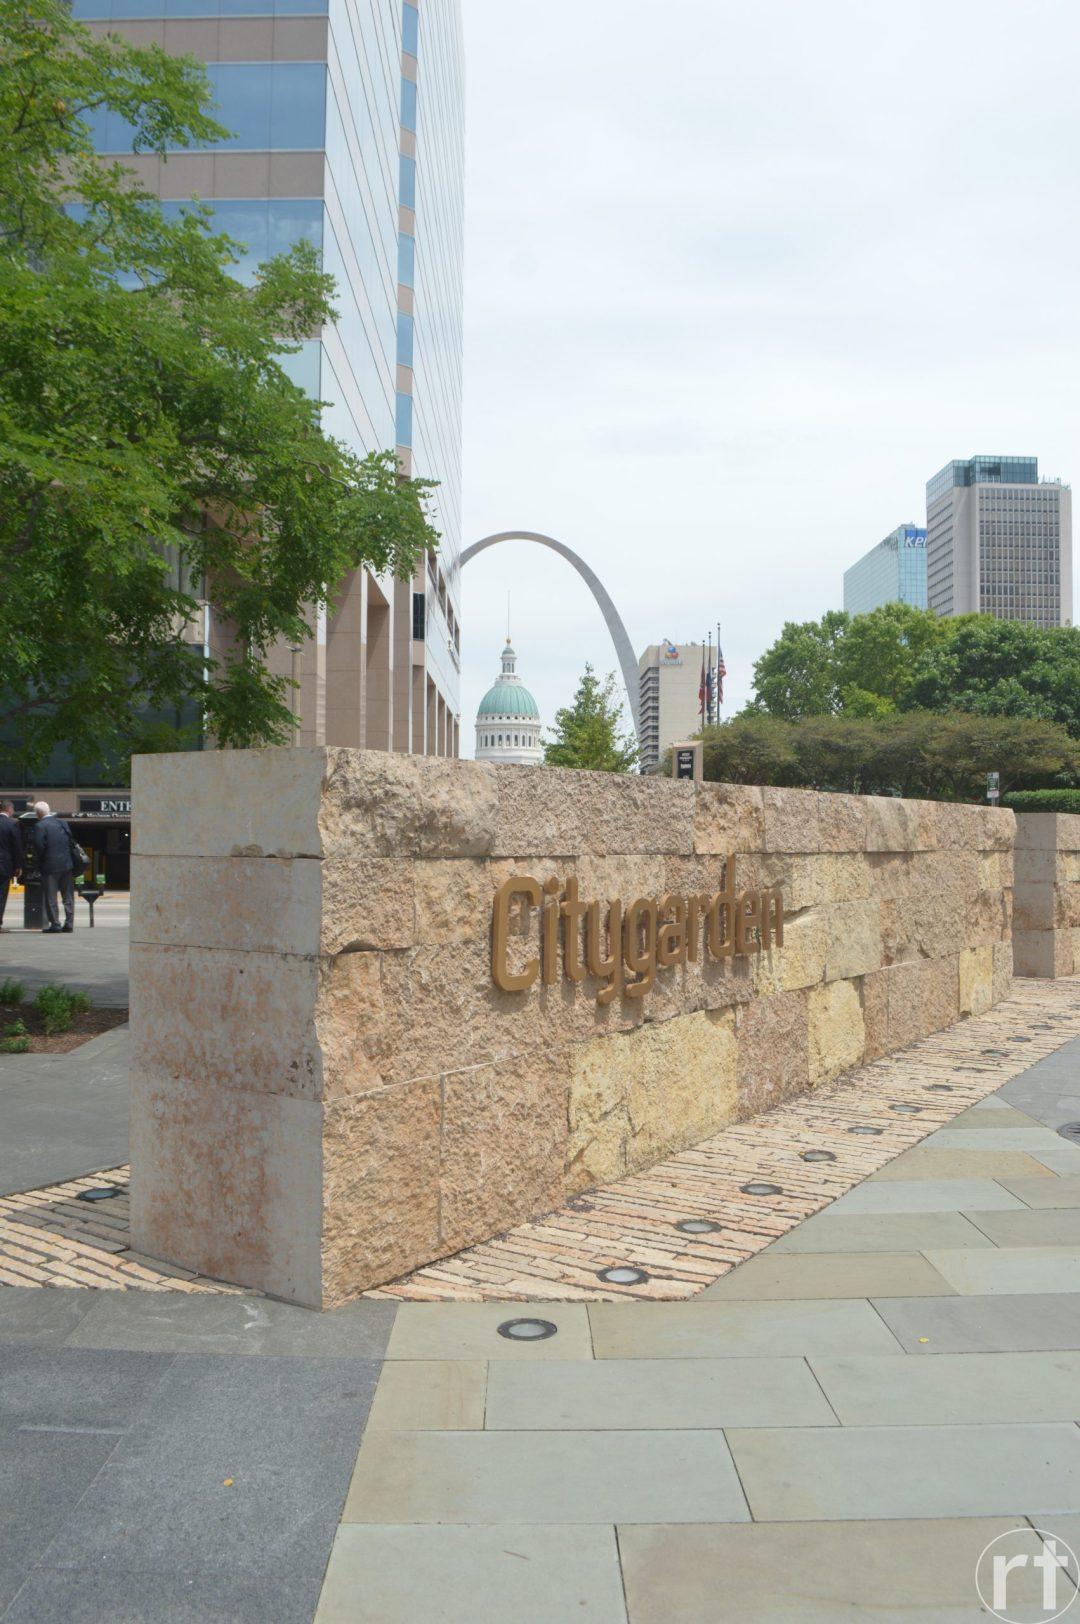 City Garden the Arch St. Louis